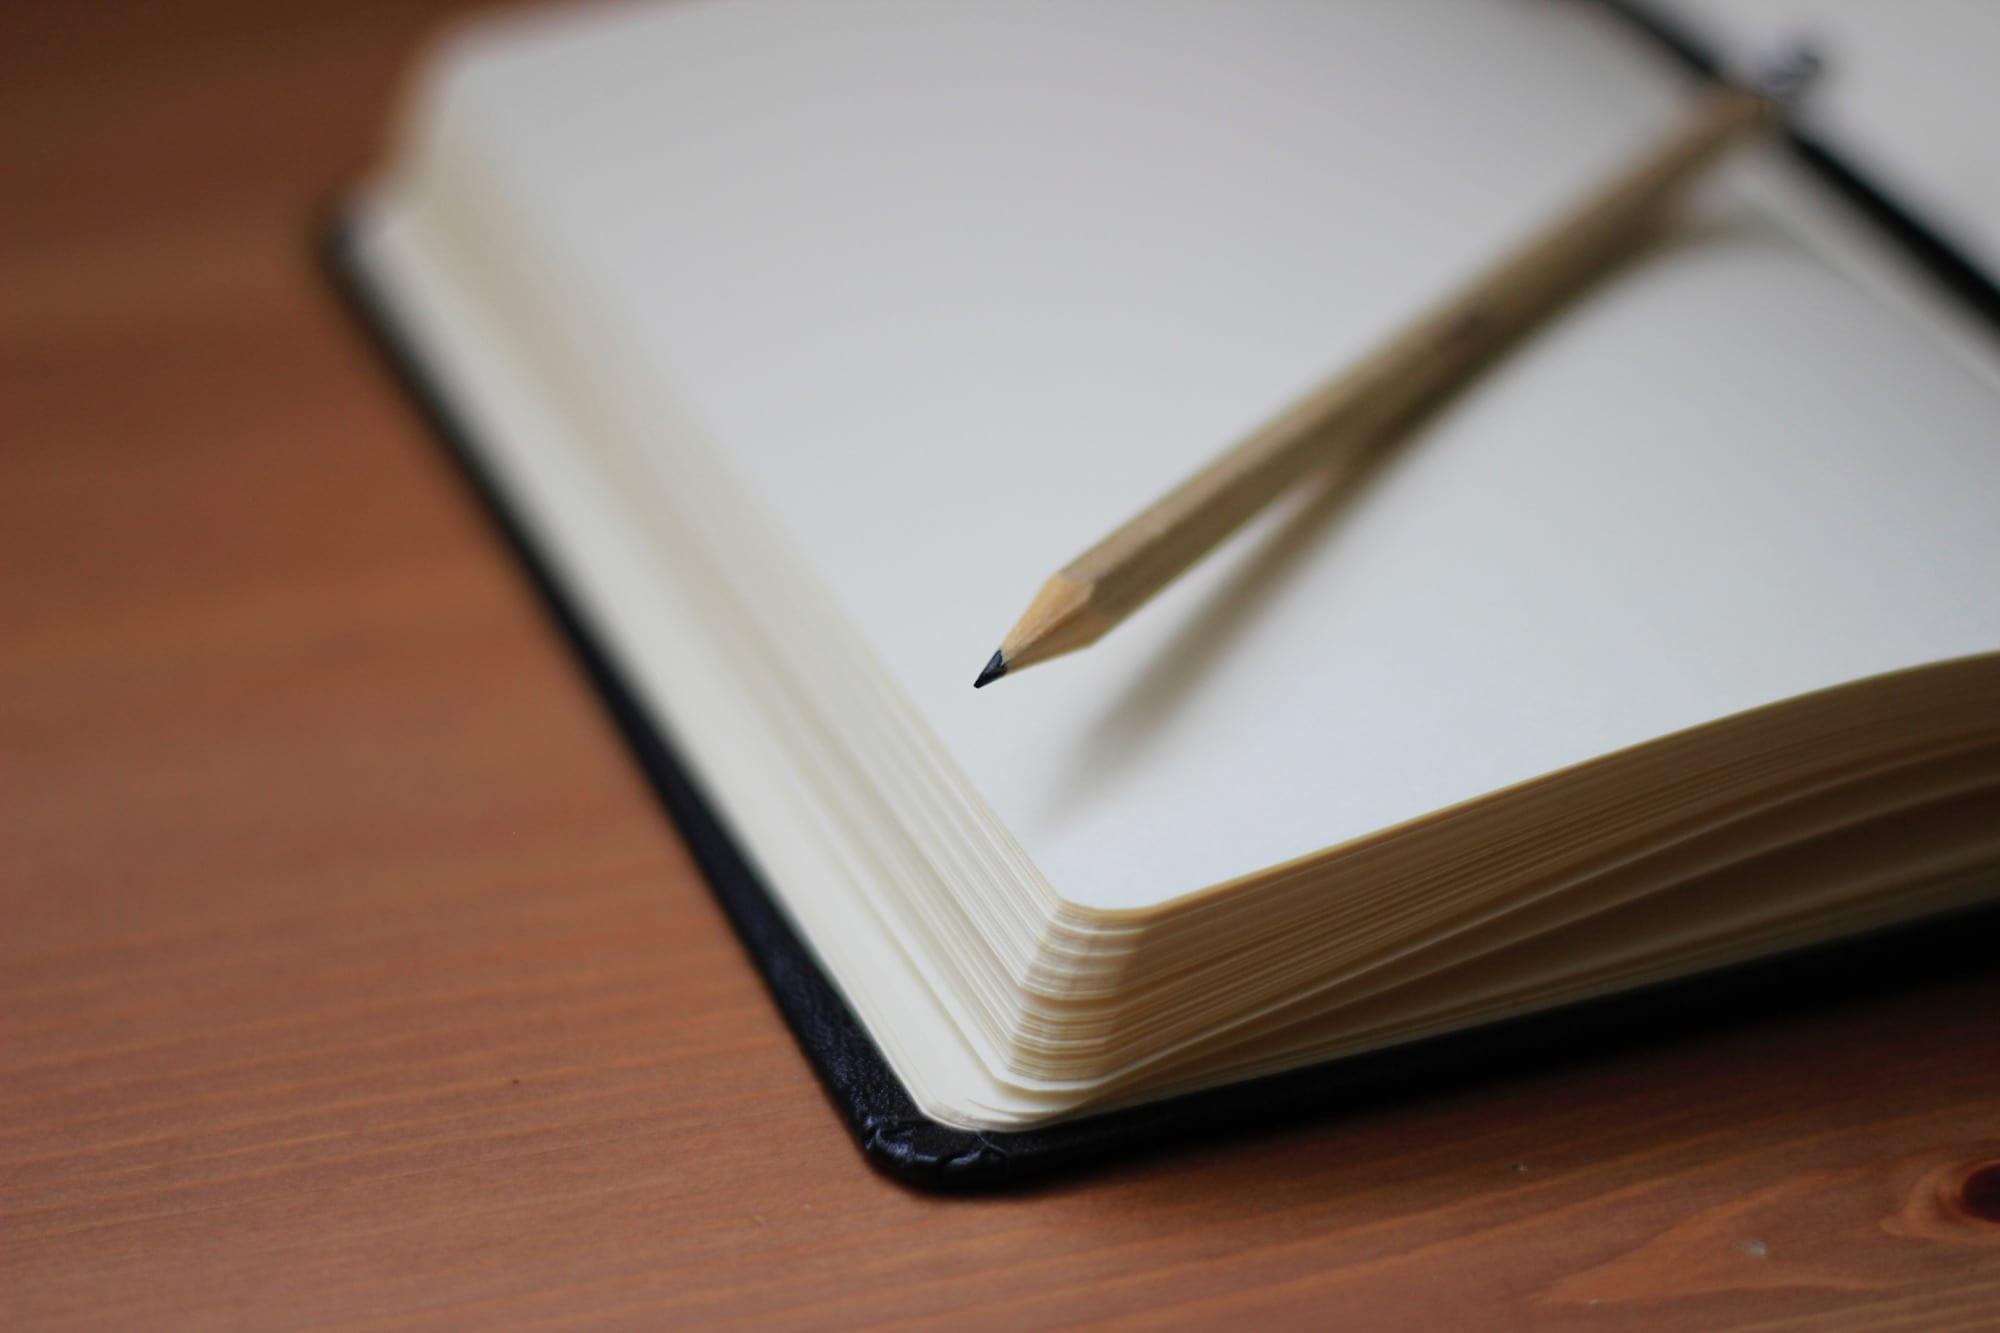 Closeup of pencil on open notebook